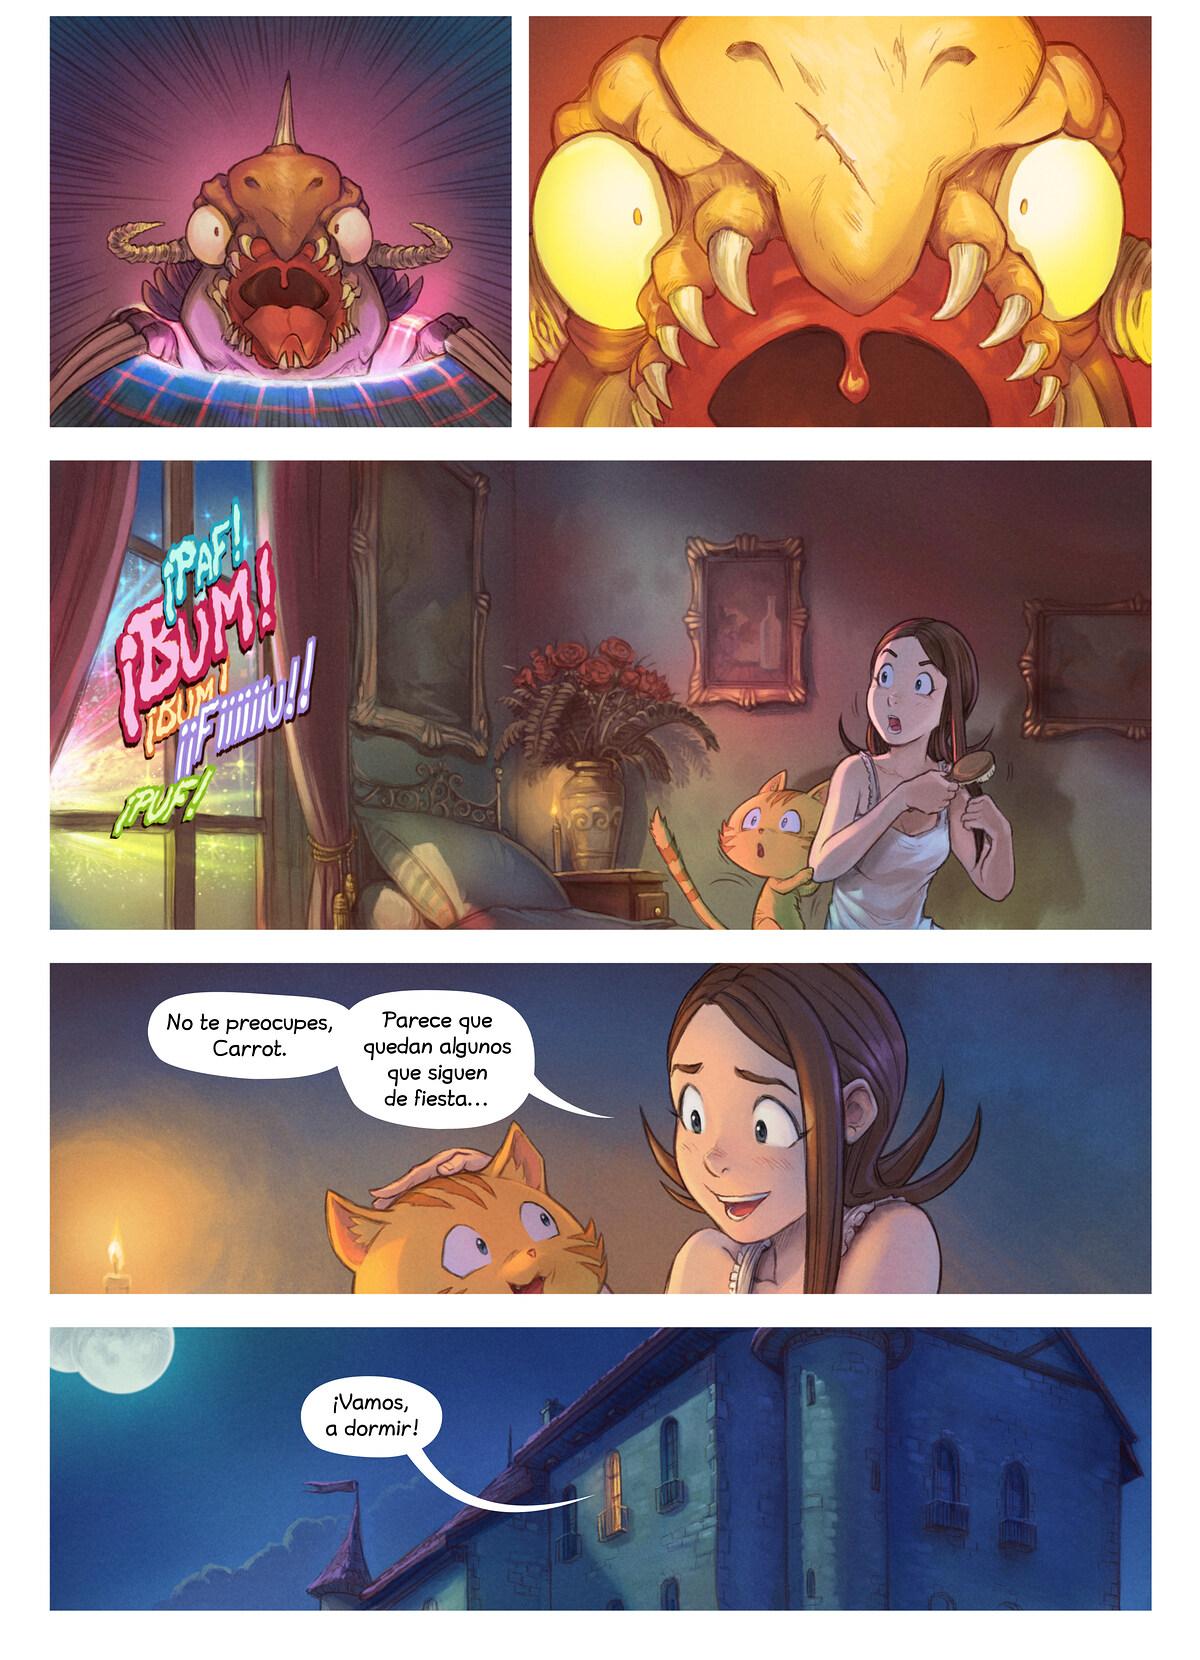 A webcomic page of Pepper&Carrot, episodio 29 [es], página 7